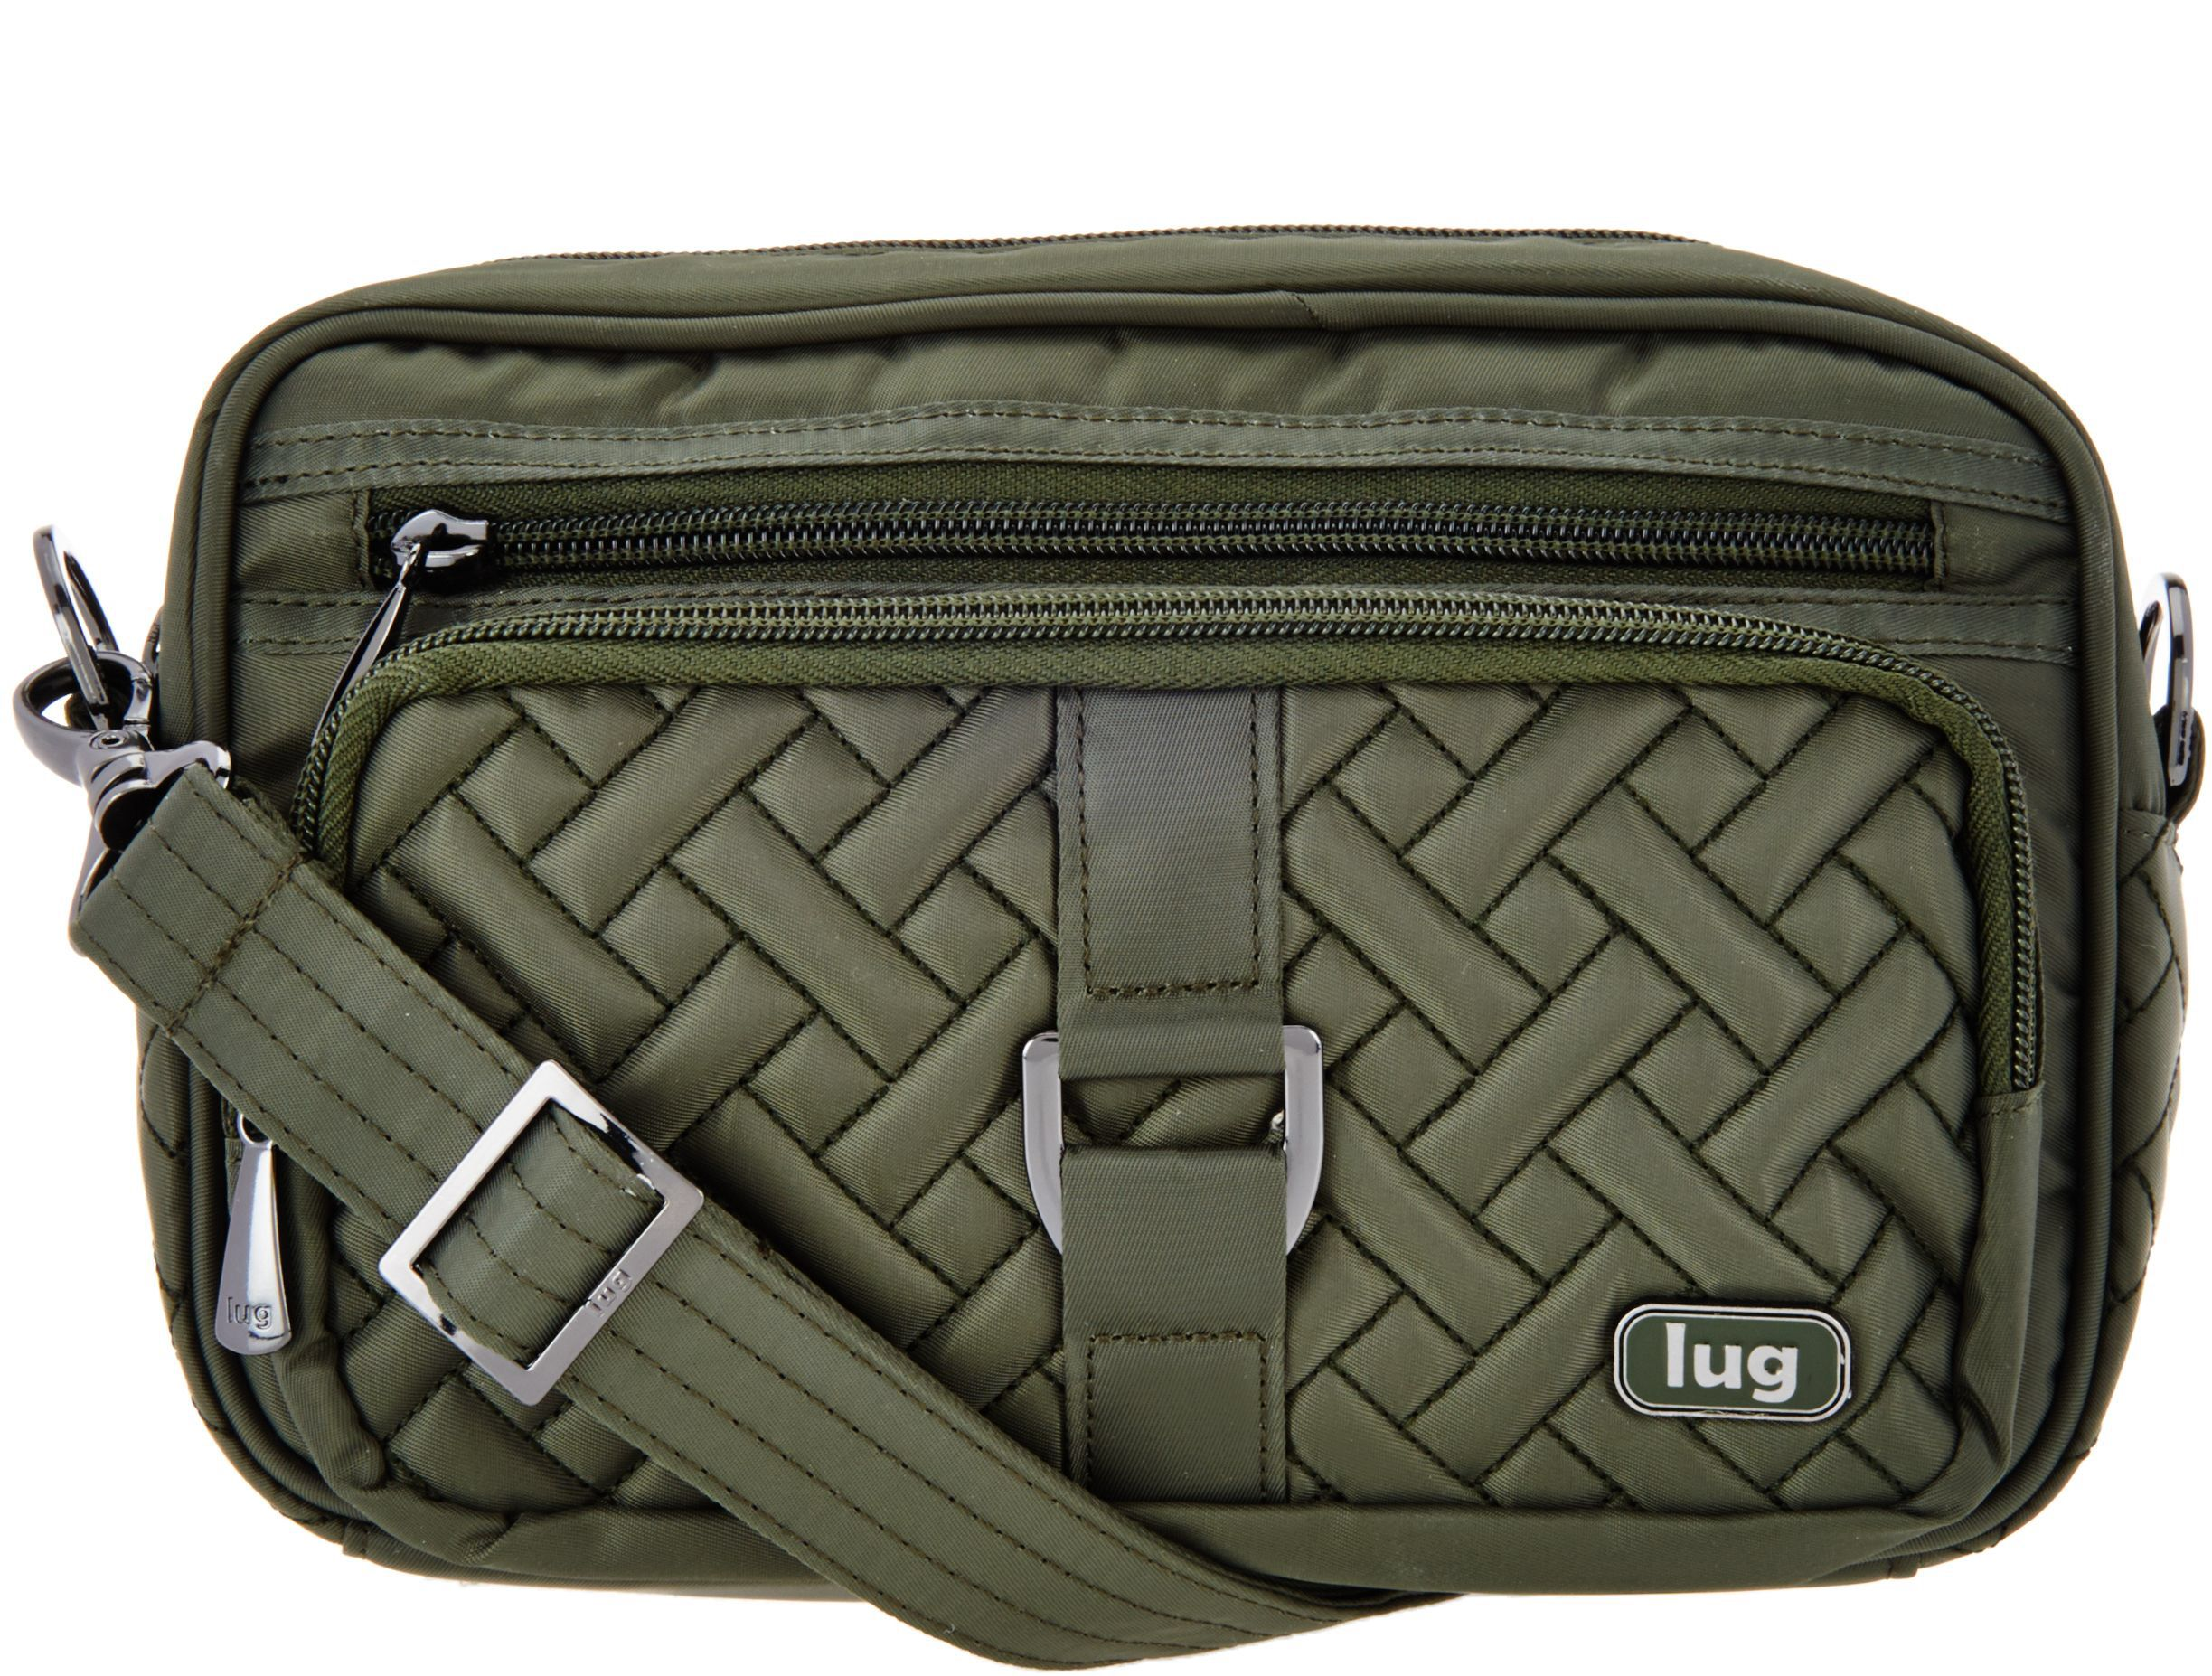 9da8b7062a74 Lug Convertible RFID Crossbody   Belt Bag - Carousel